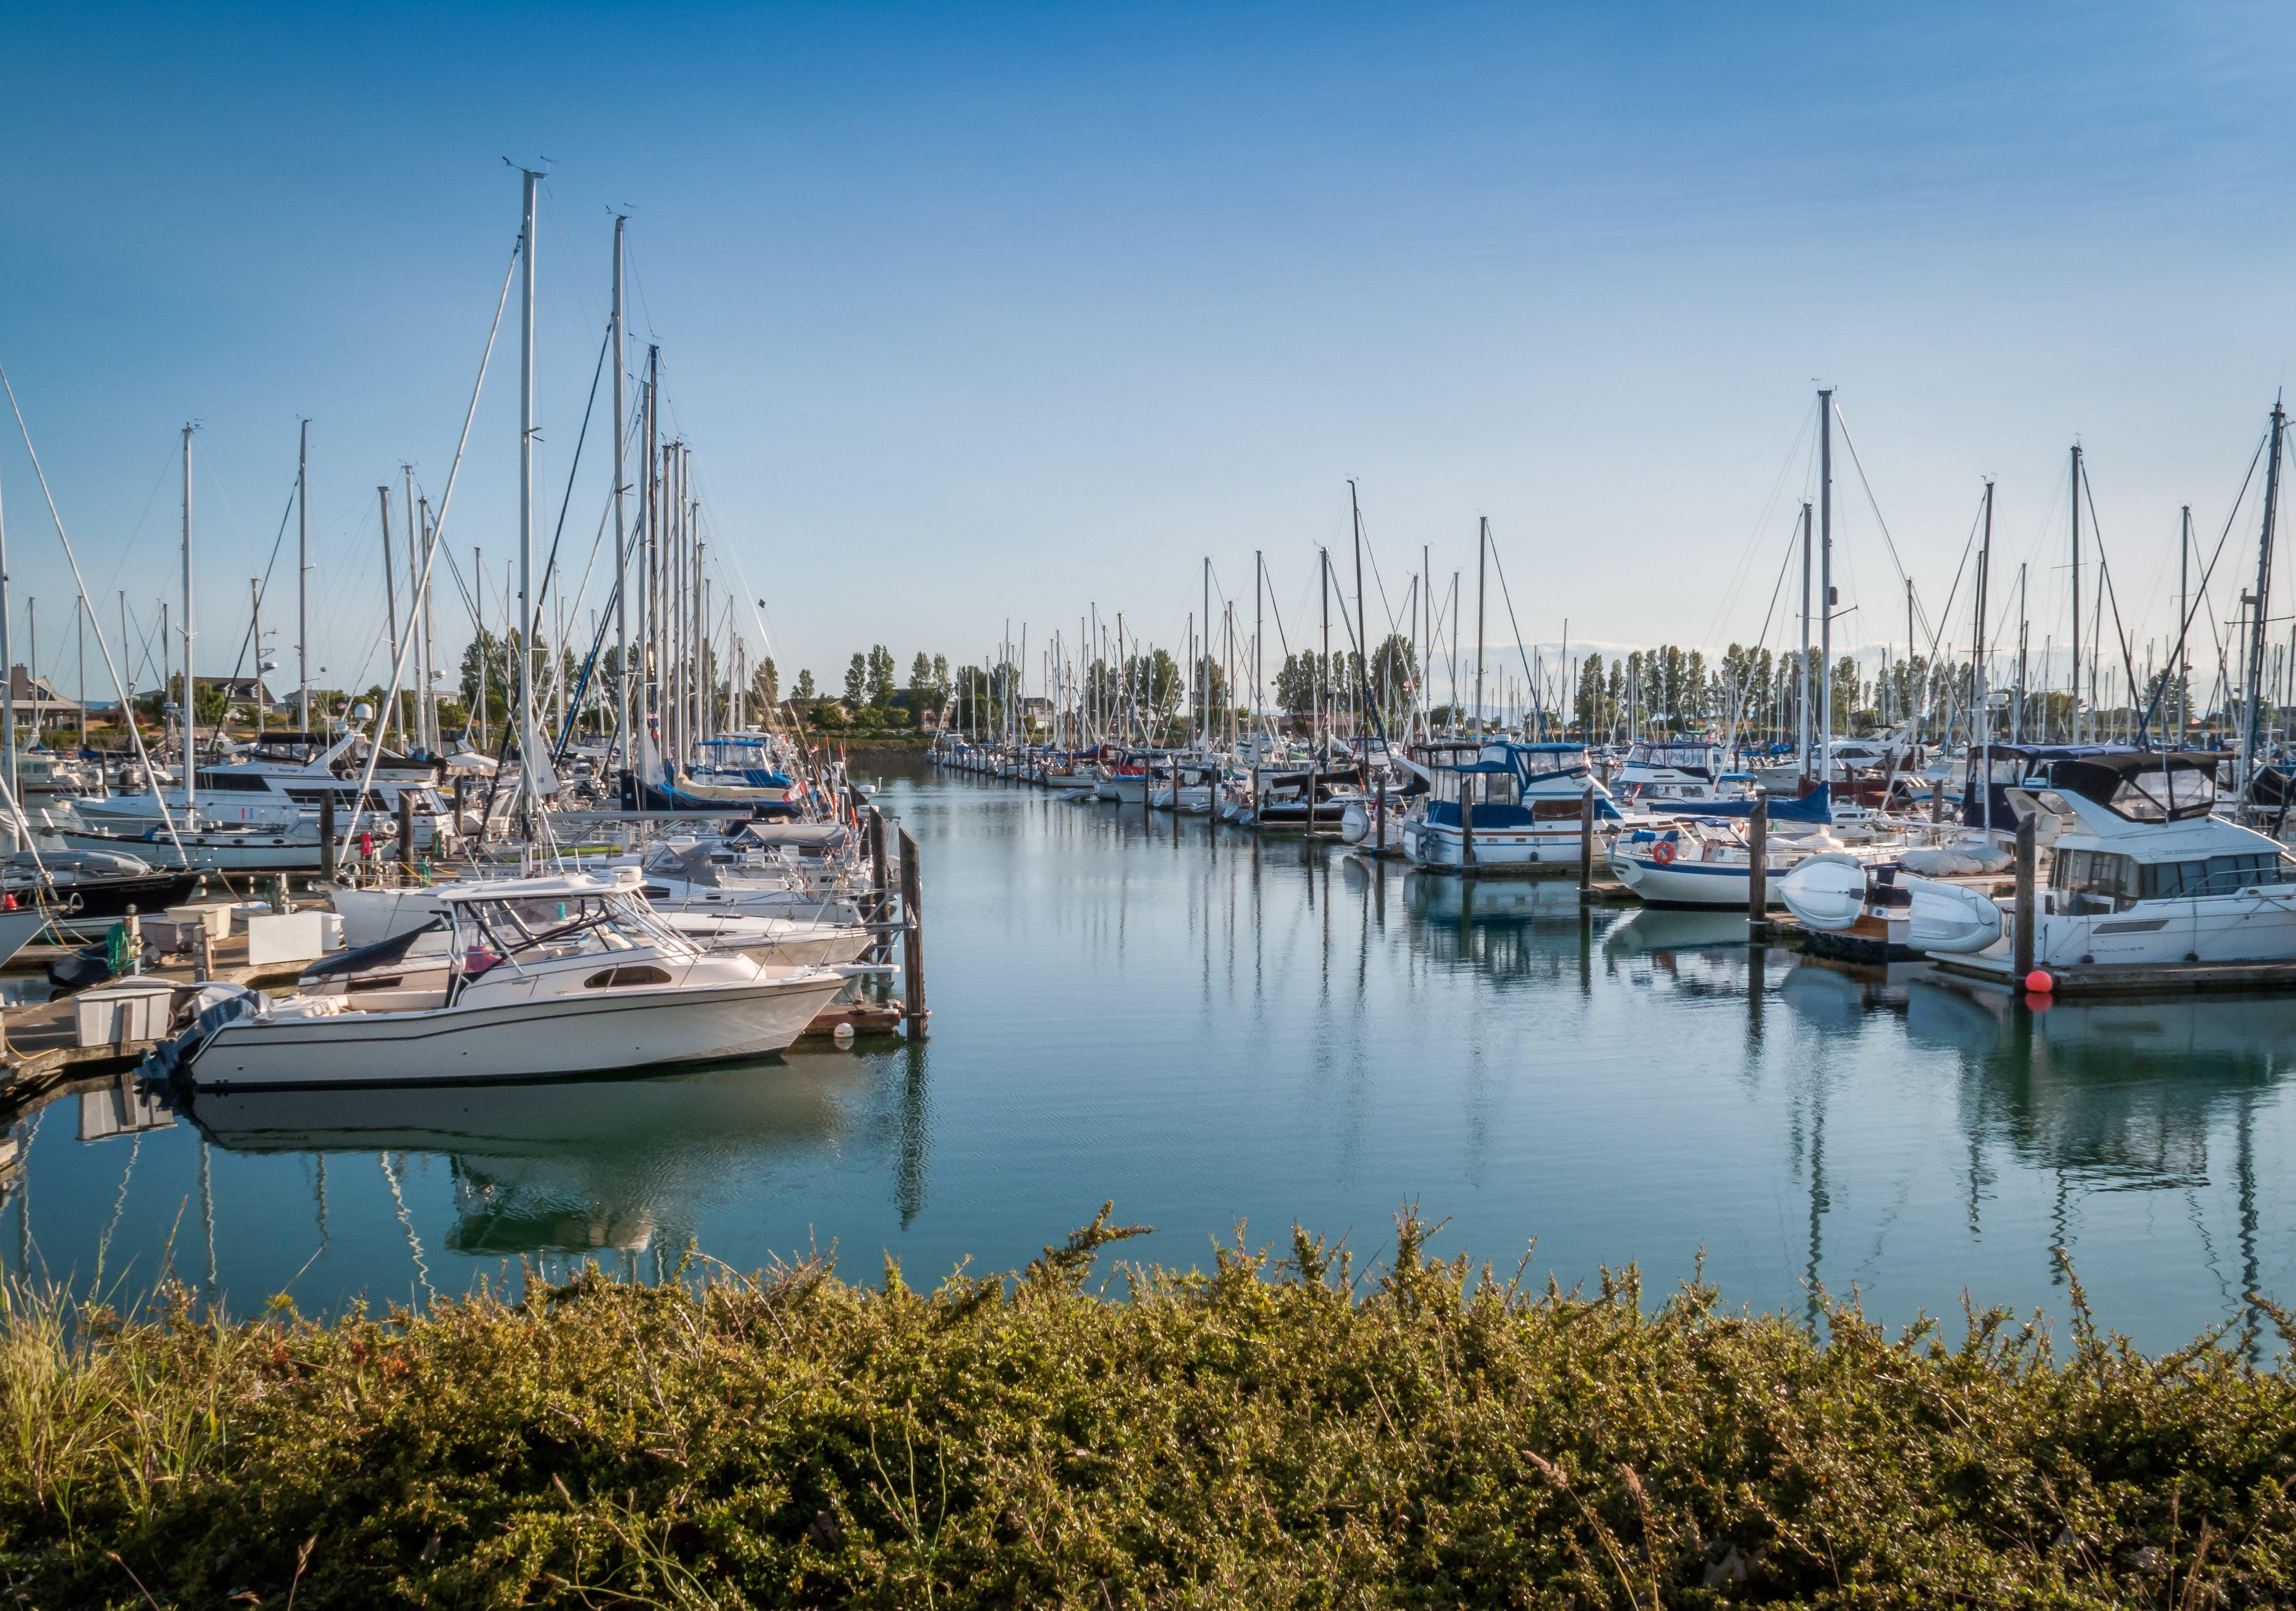 sail boats and yatchs anchored in marina